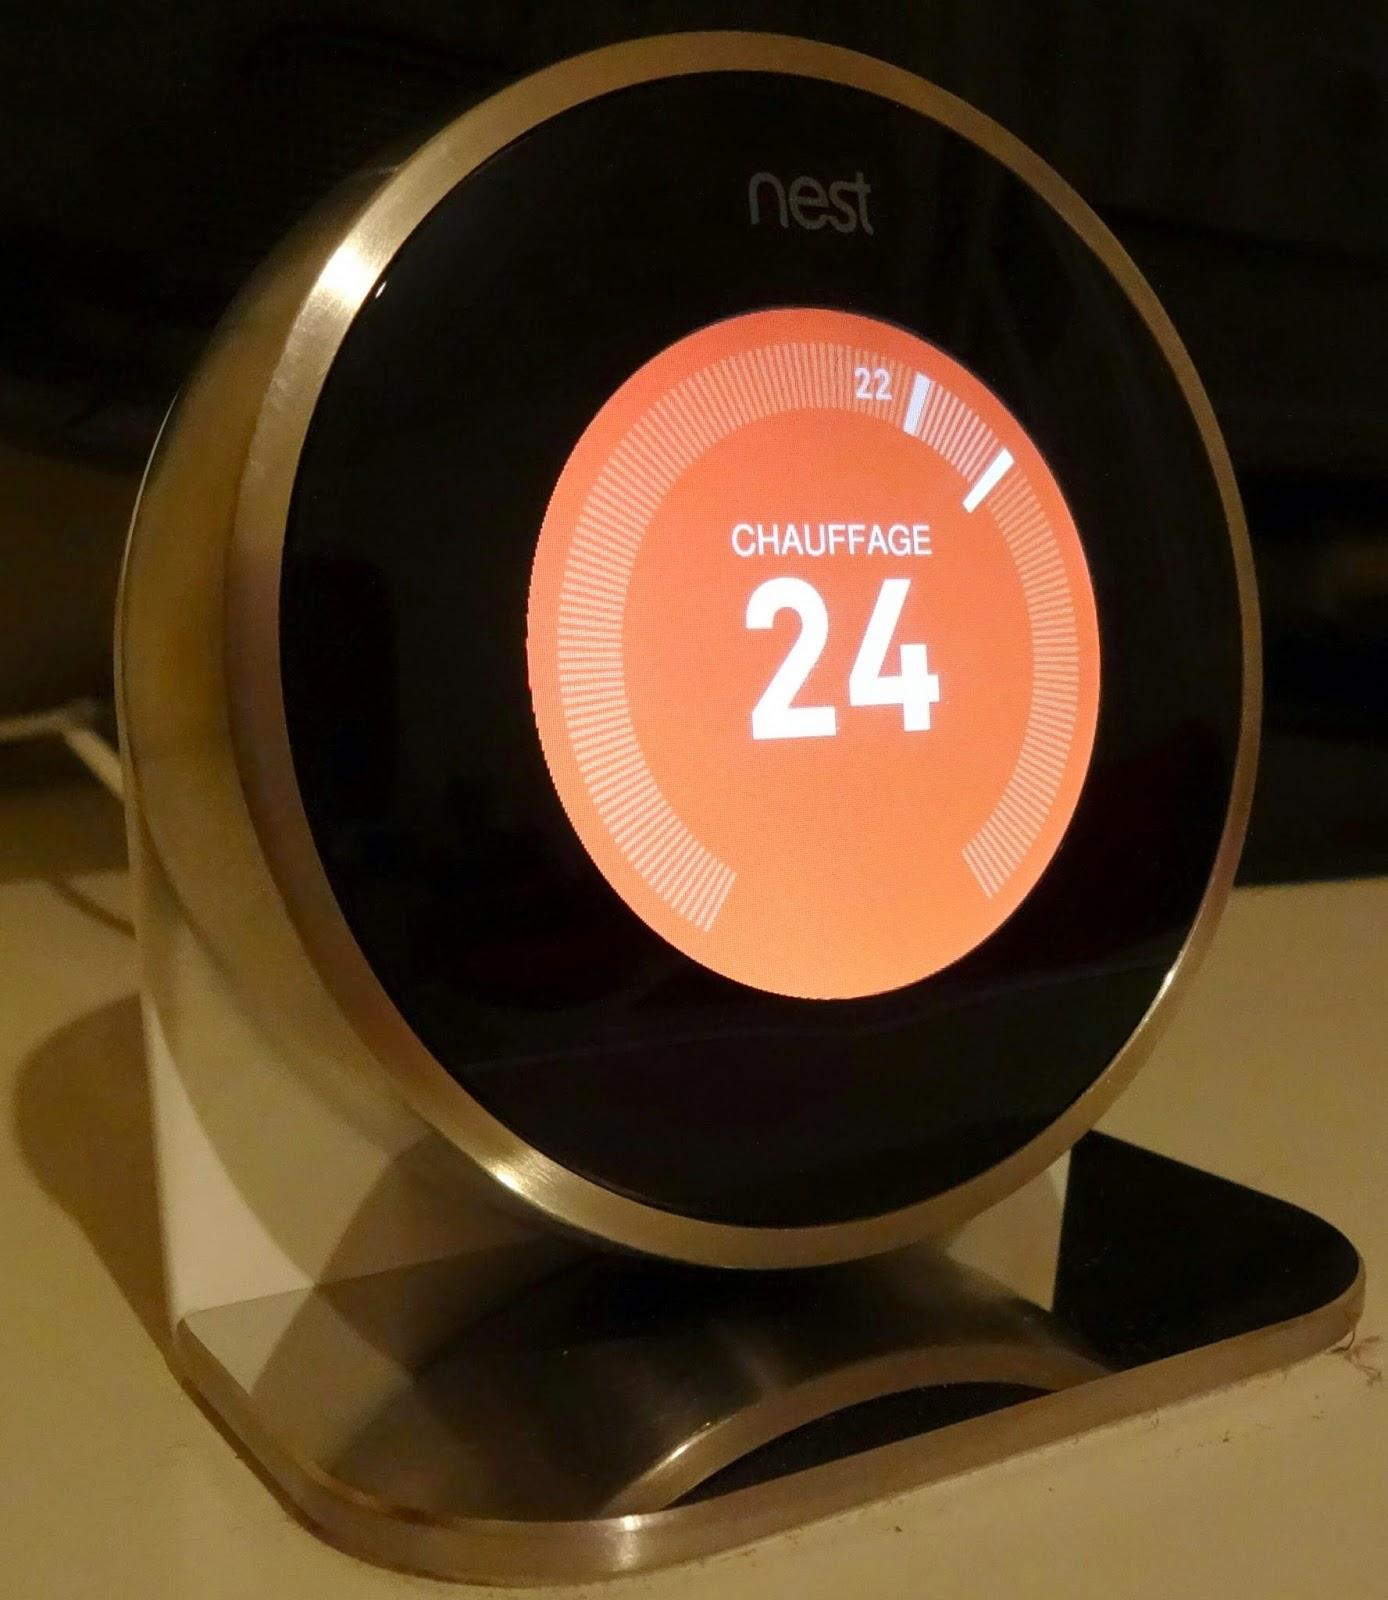 Mes droldids installer un thermostat connect nest - Thermostat connecte nest ...